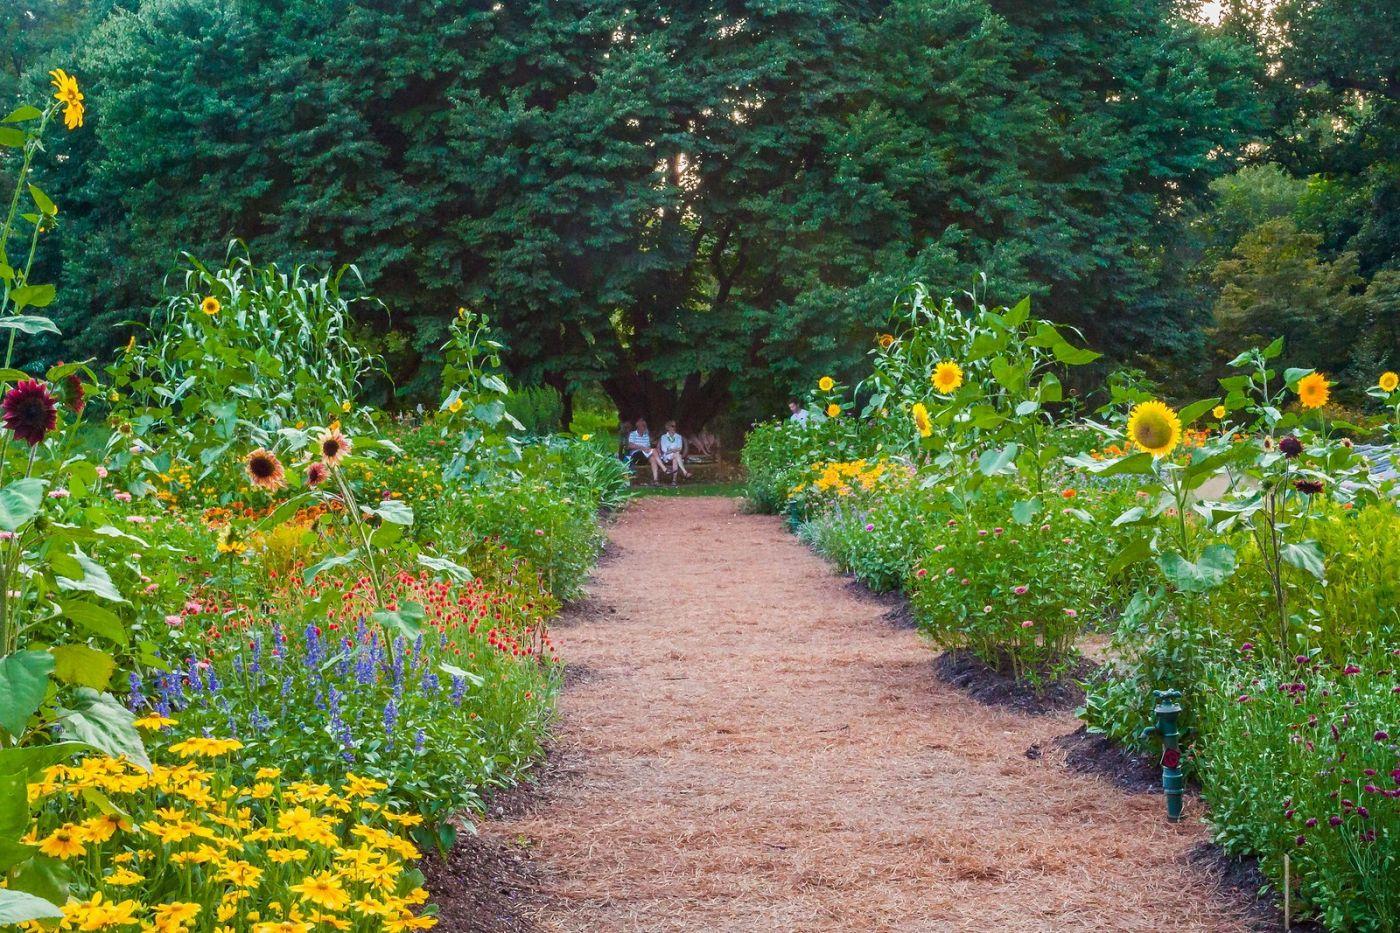 Chanticleer花园,融入自然_图1-24